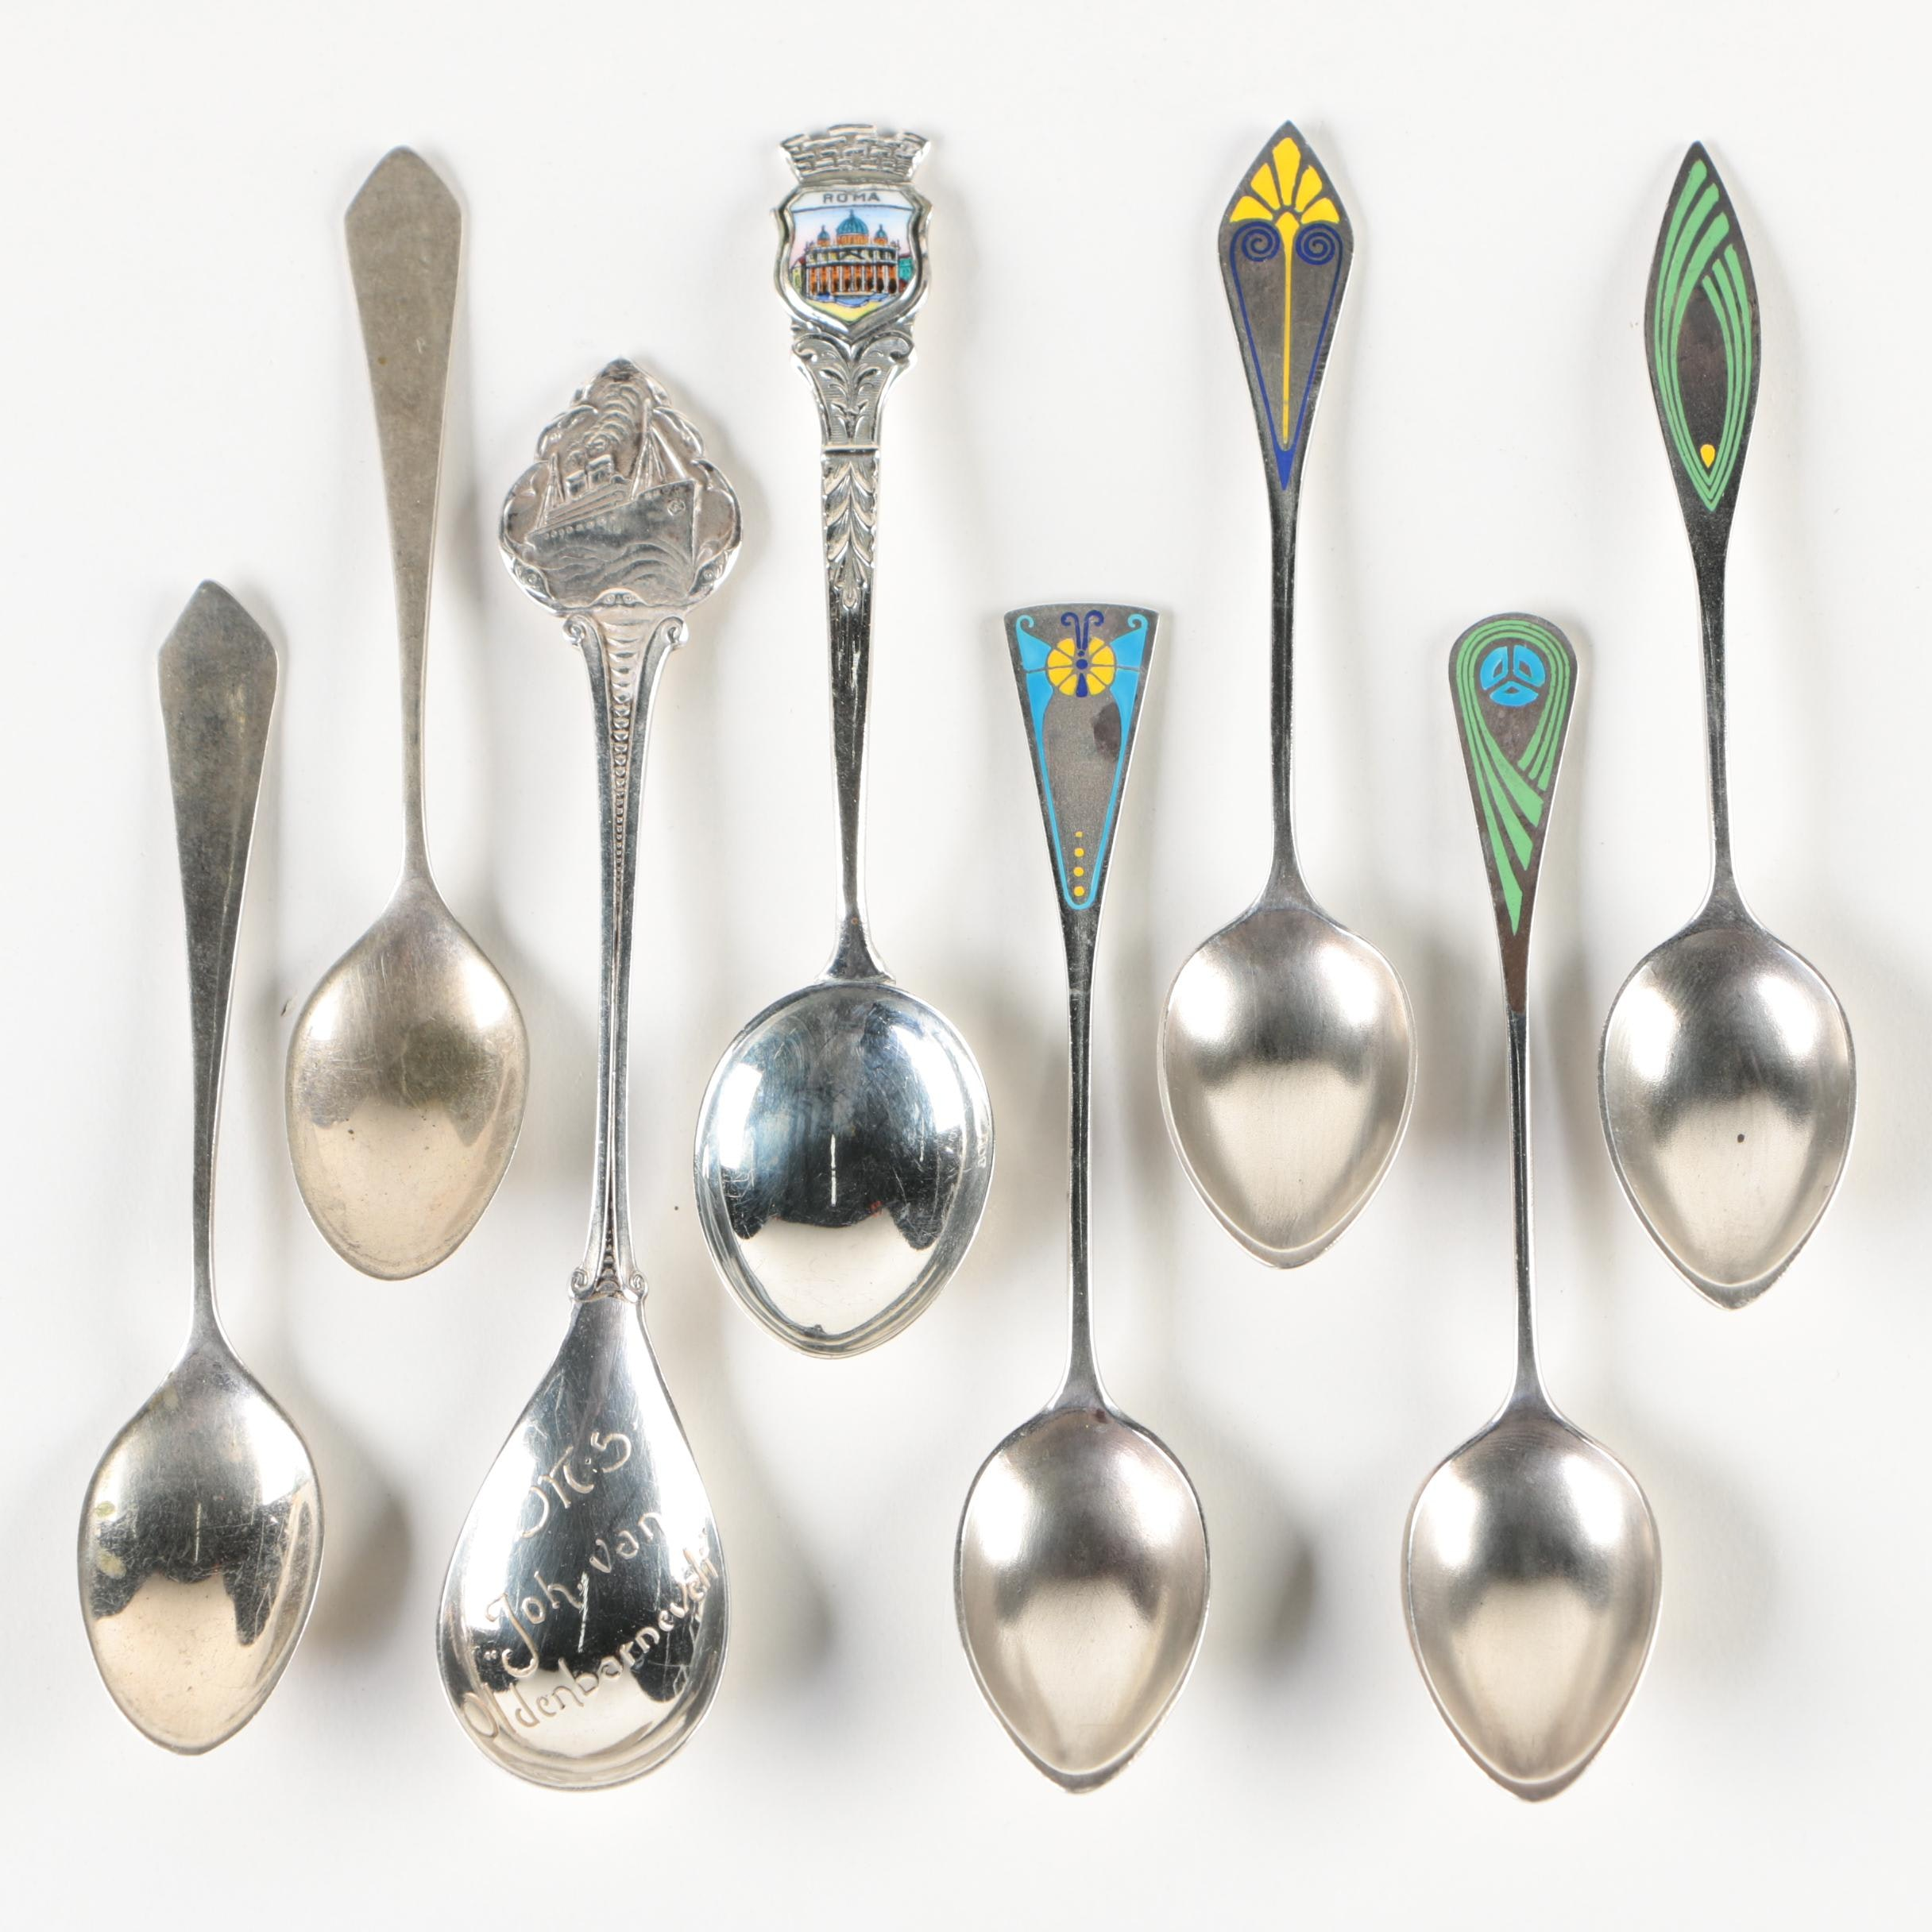 "Hooijkaas ""MS Johan Van Oldenbarnevelt"" Spoon with Other Silver Souvenir Spoons"